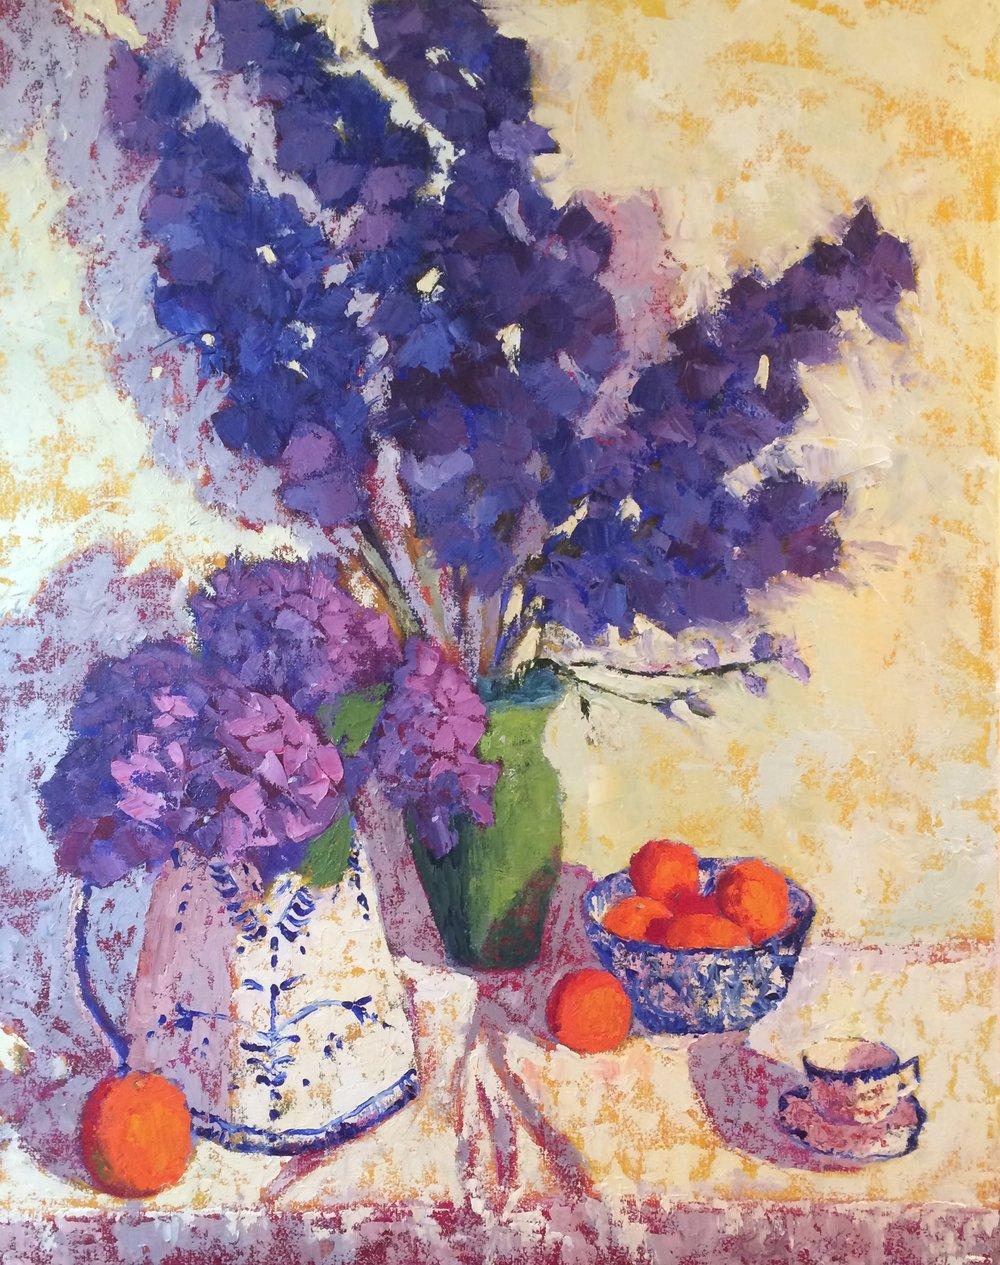 """Delphinium Blues"" 30""x24""x1.5"" oil on deep gallery wrap canvas - SOLD"